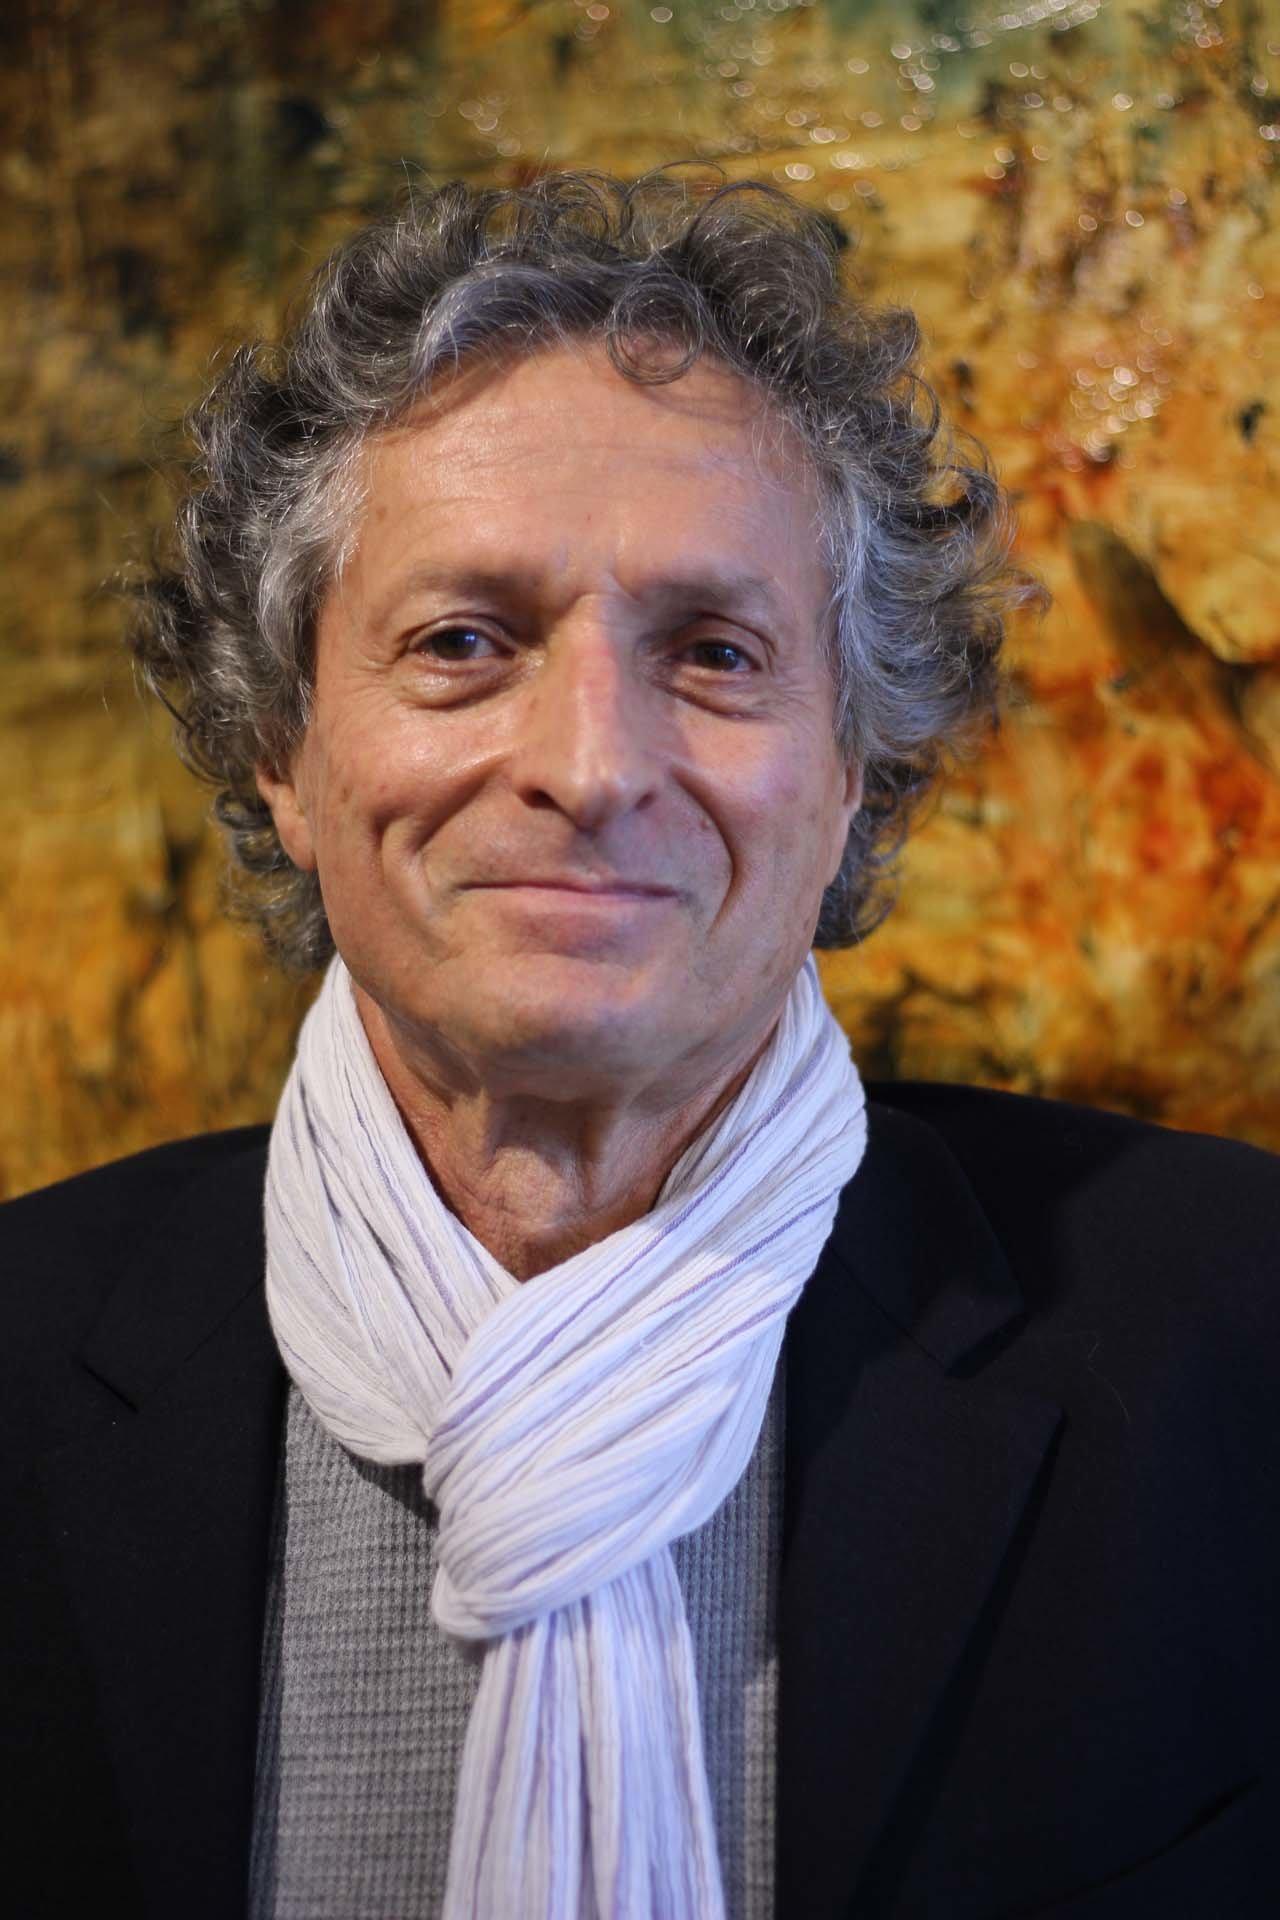 Jean-Jacques Waldispuhl à la Ferus Gallery